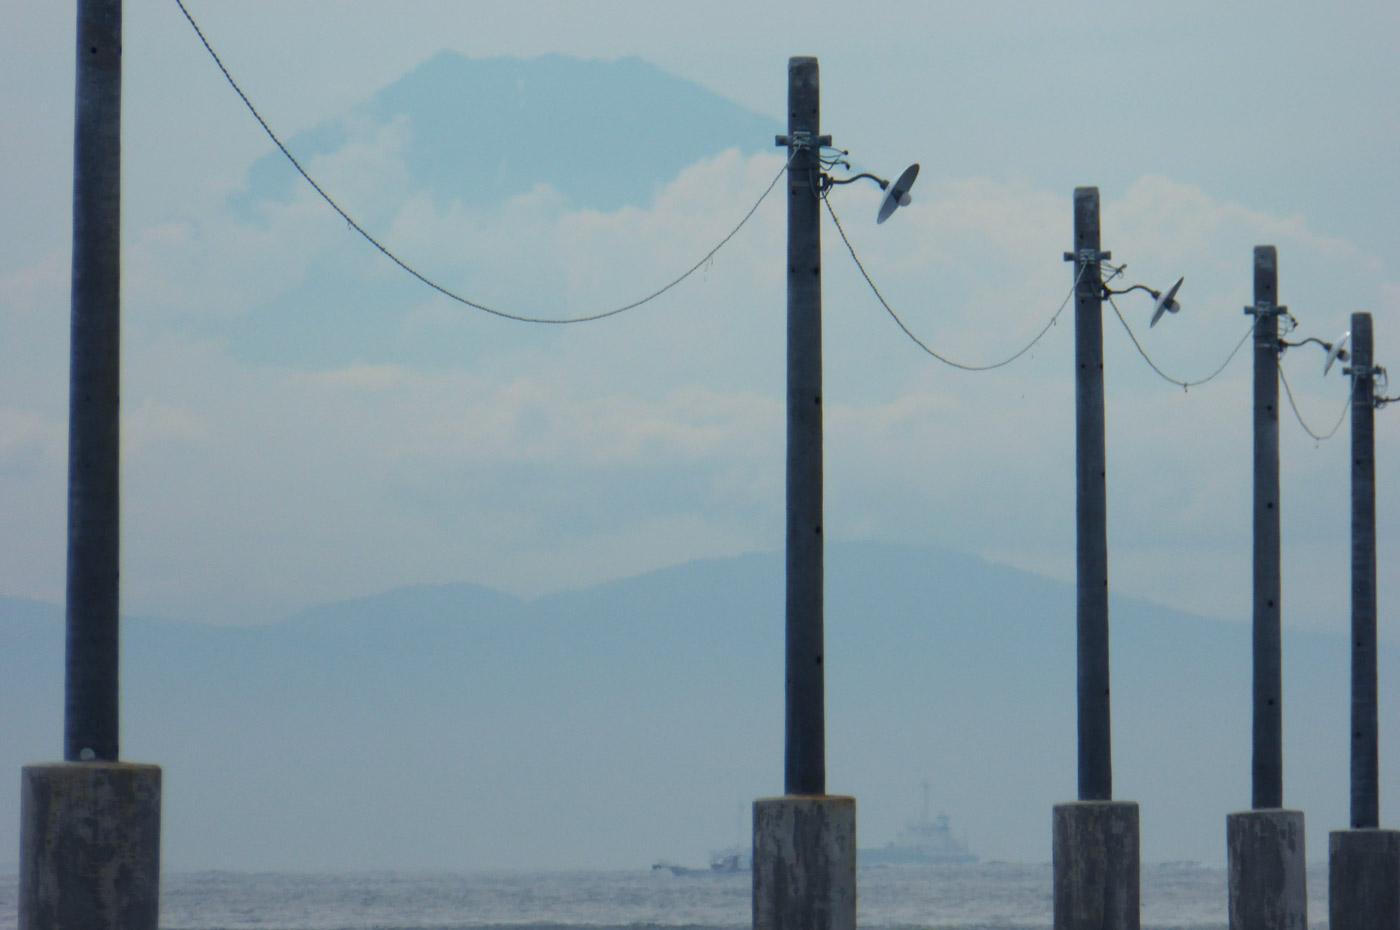 原岡桟橋の富士山(望遠)